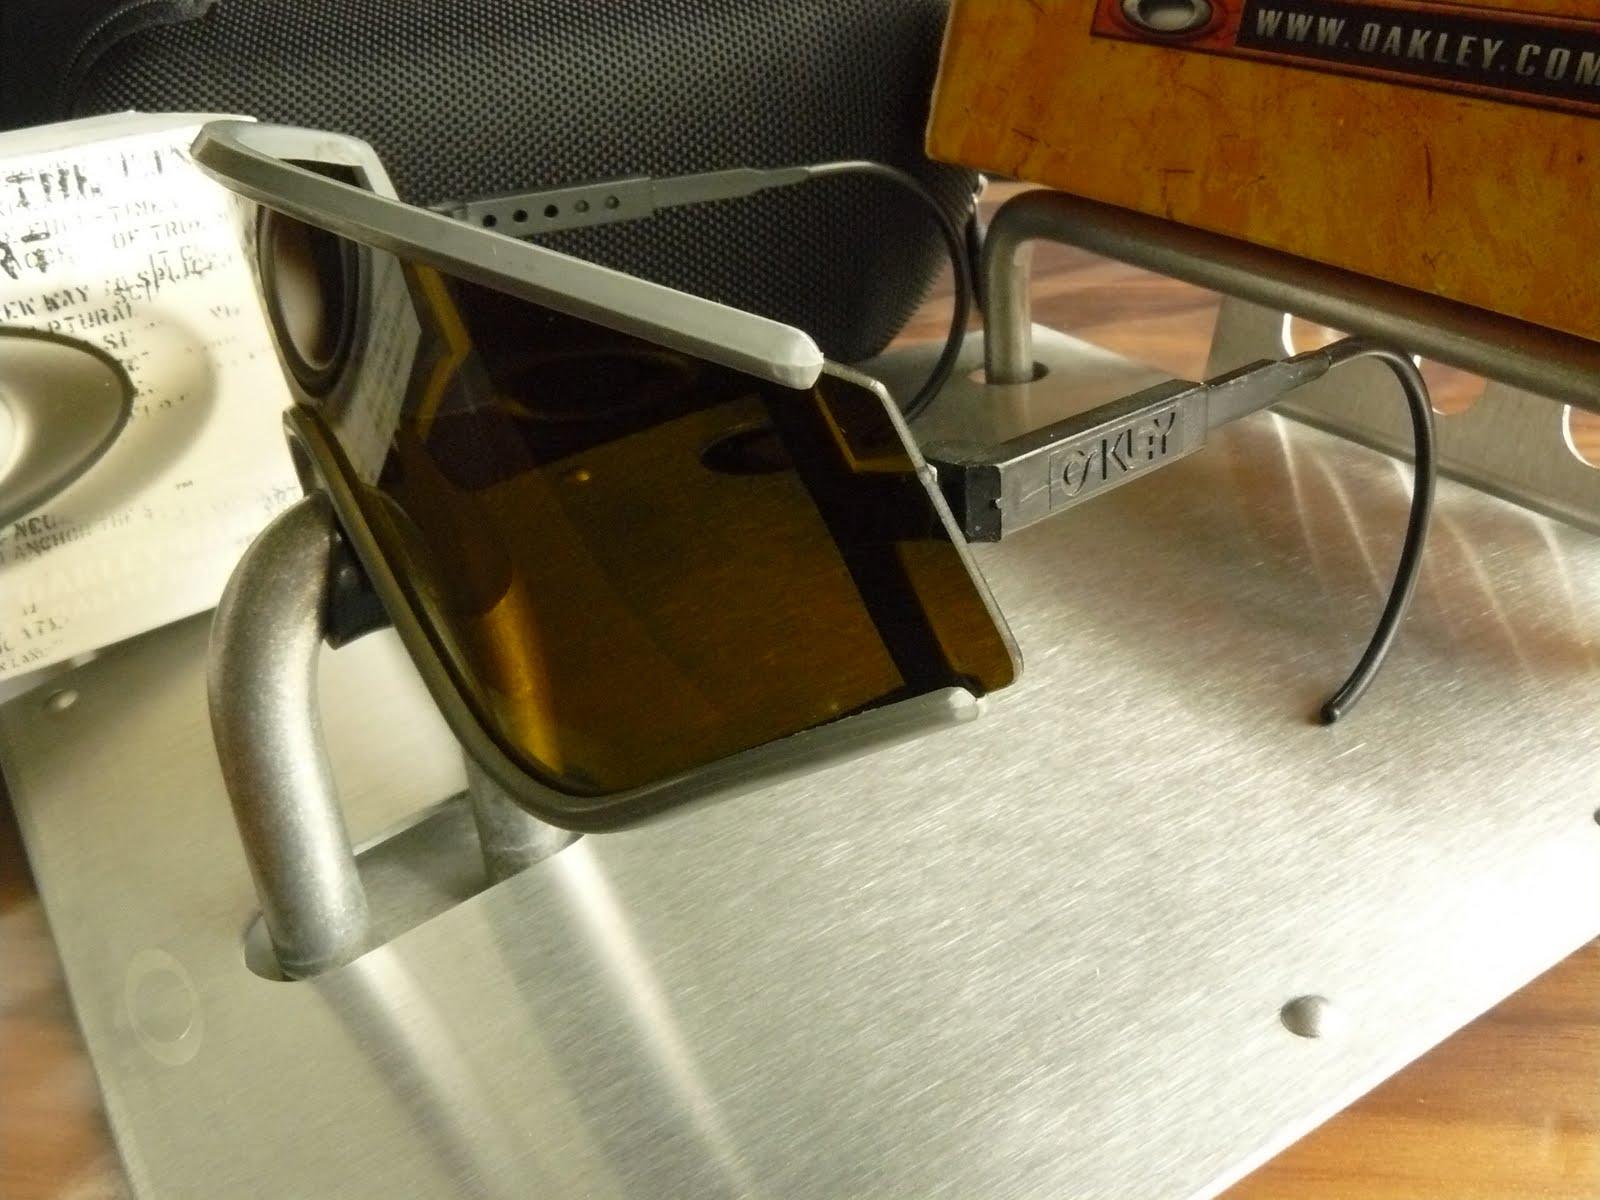 84f515472352 My Vintage Oakleys. Eyeshade(1984), Grey frame with Bronze lens, SKU 03-005